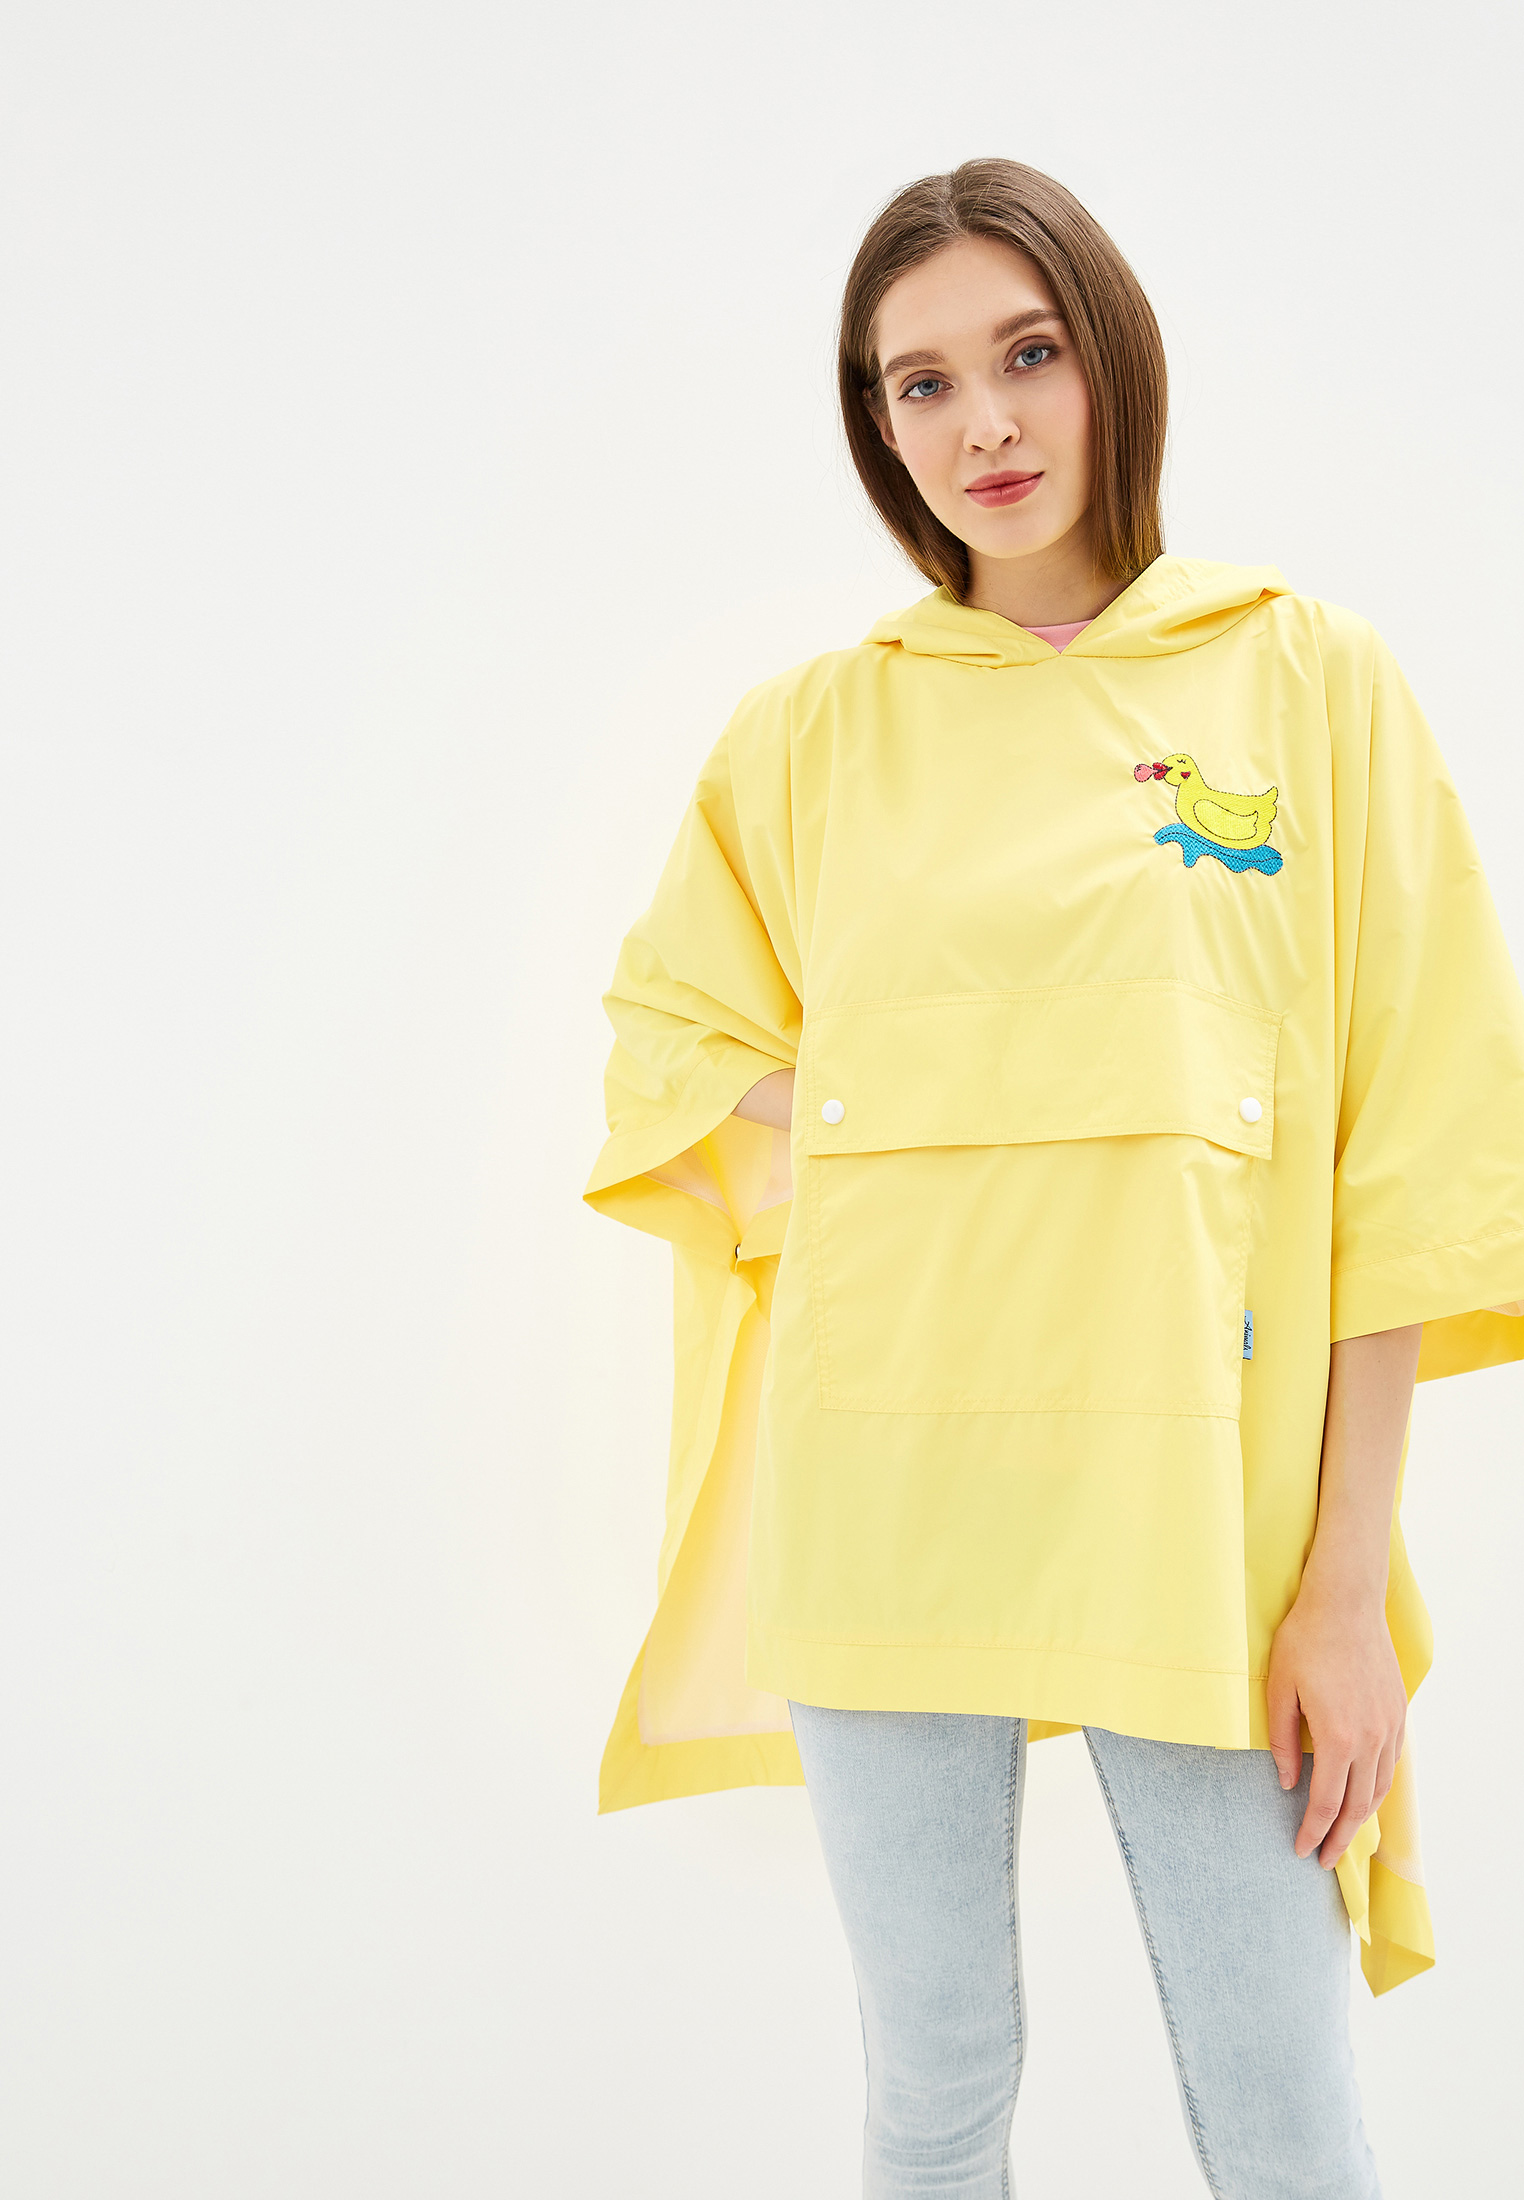 Плащ, Animals, цвет: желтый. Артикул: MP002XW0R92A. Одежда